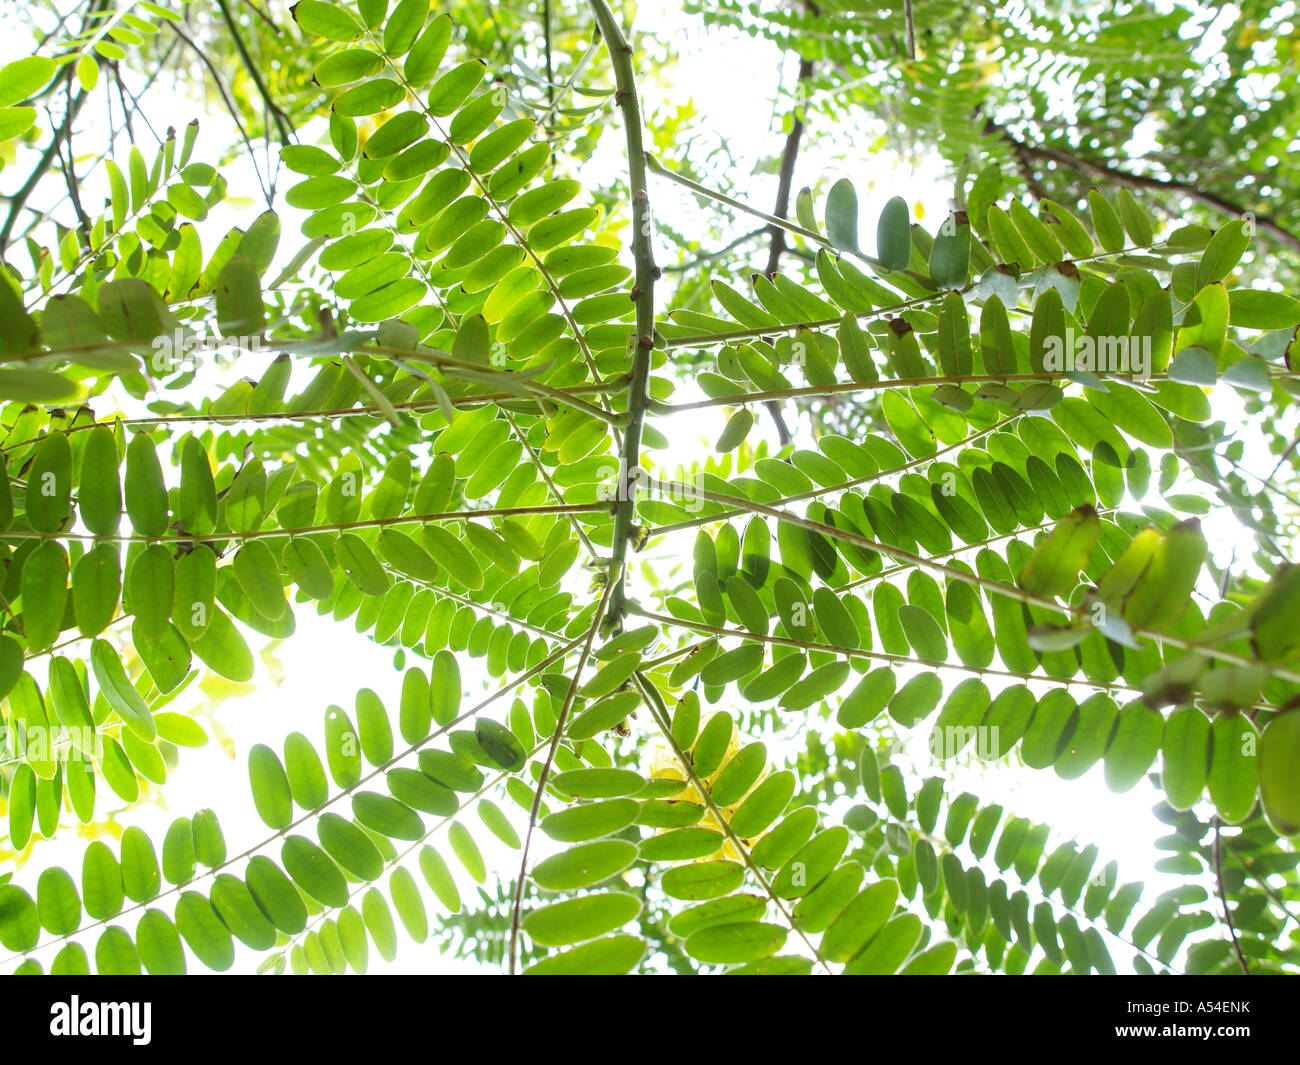 Yellow Jacaranda High Resolution Stock Photography And Images Alamy